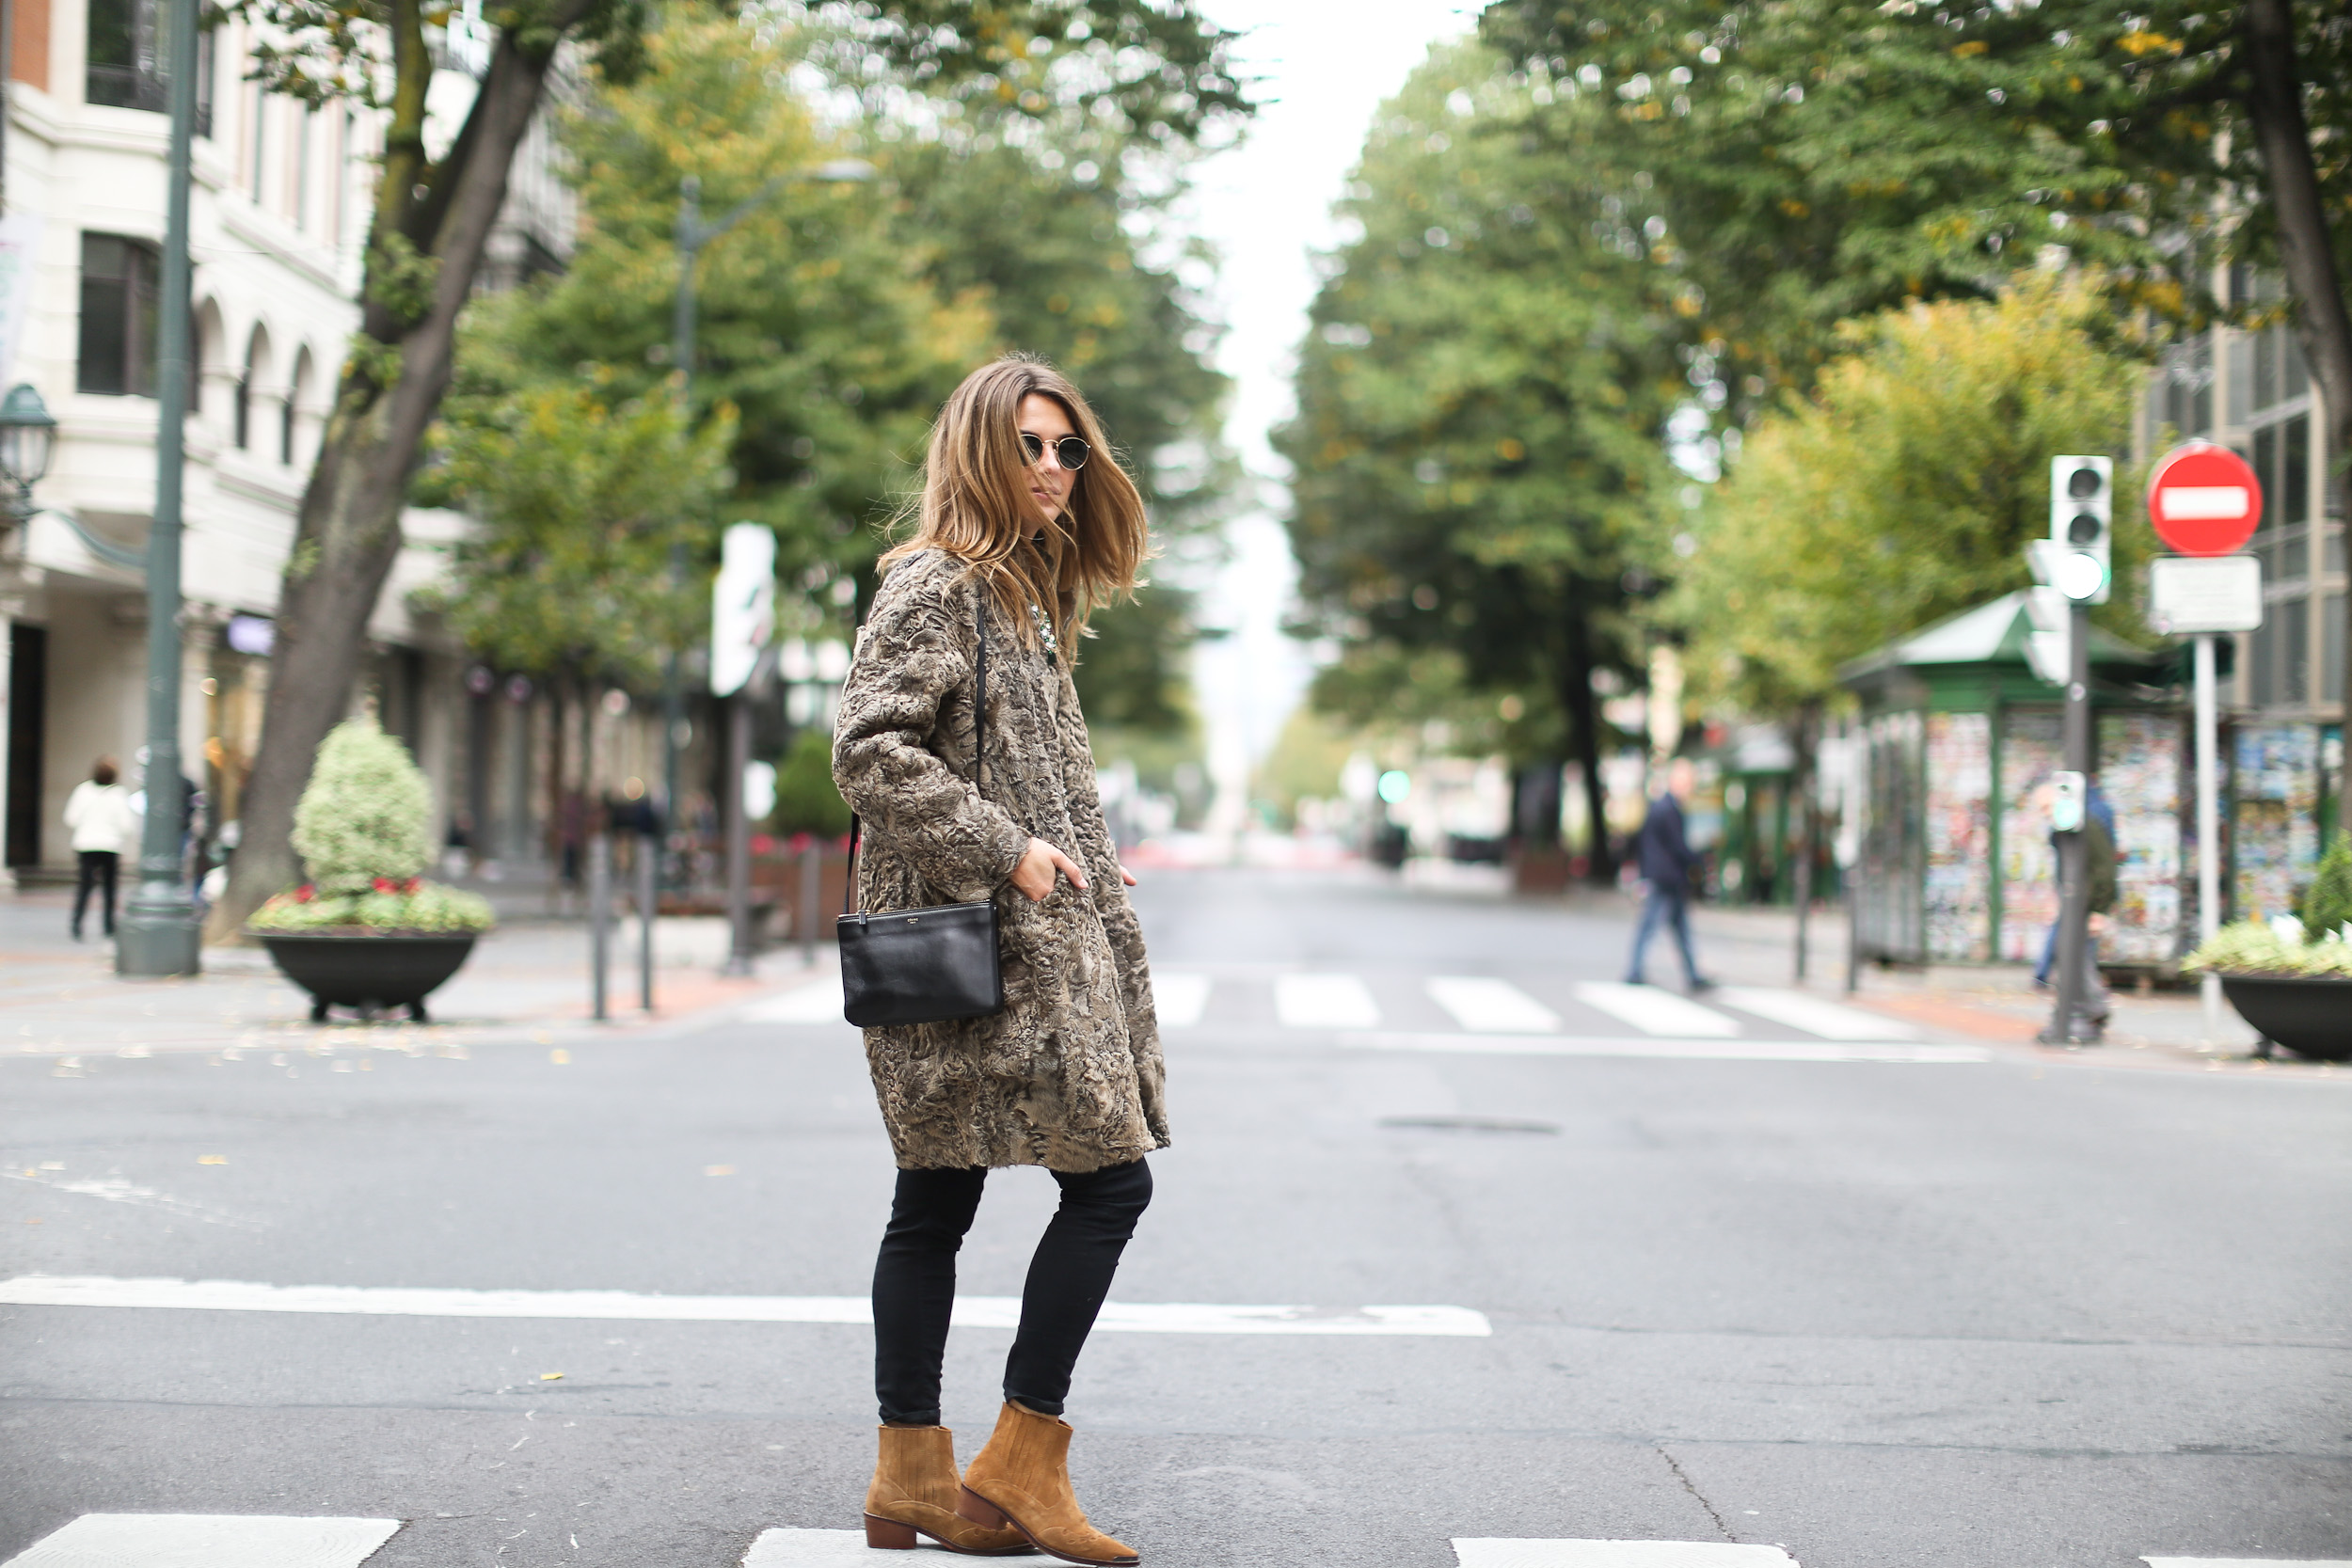 Clochet_streetstyle_boxcalf_chaqueta_ante_pelo_astracan_kalam_bilbao-17